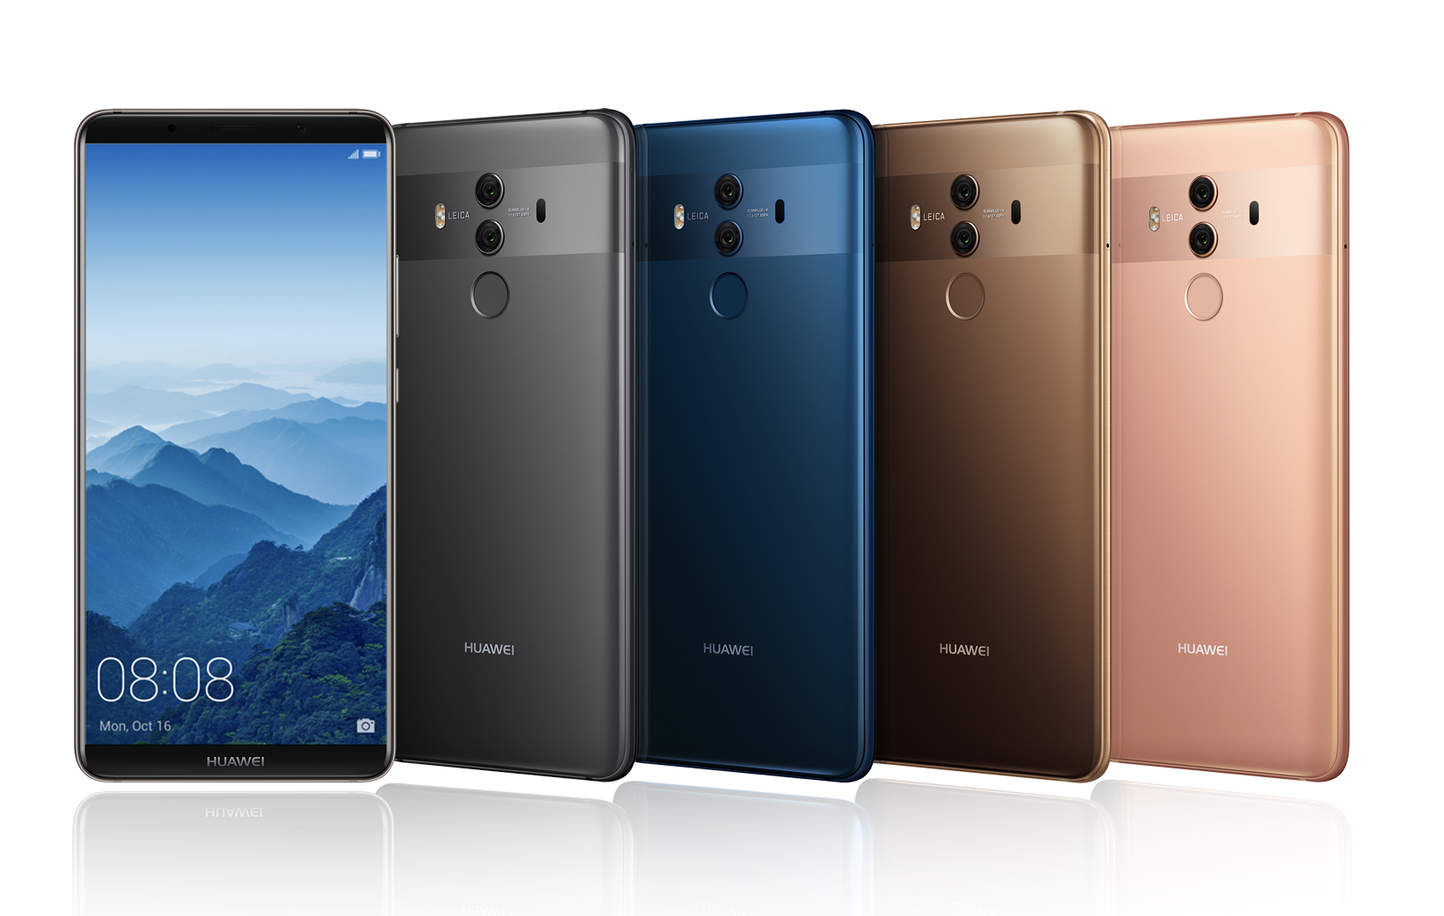 Huawei-Mate-10-Mate-10-Pro